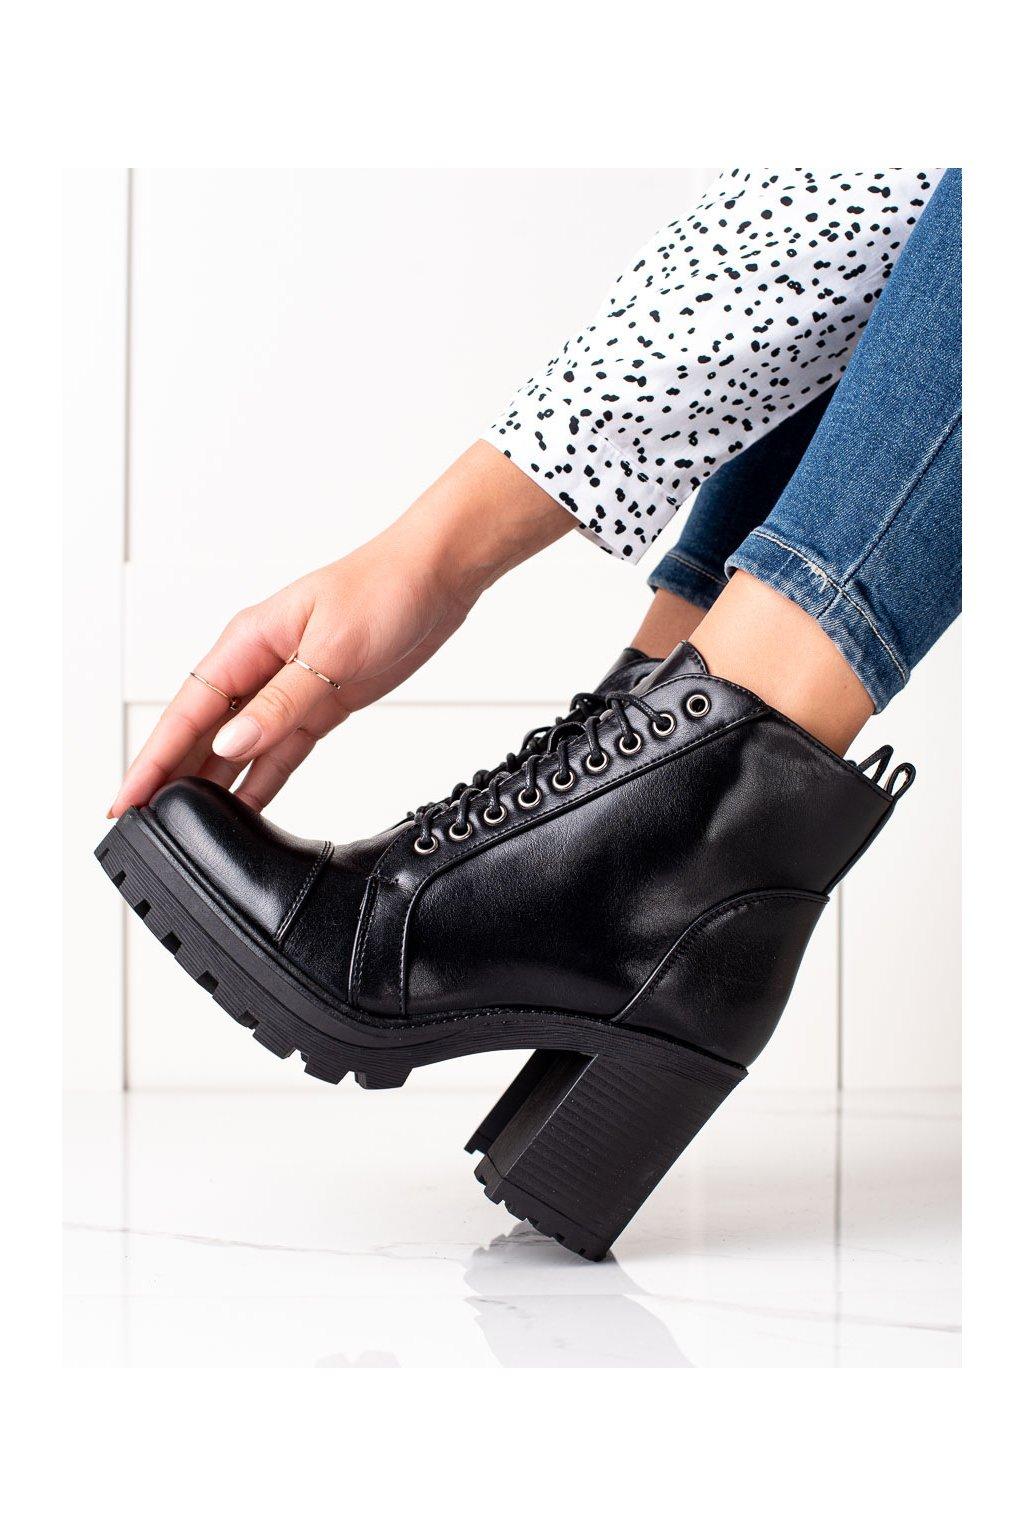 Čierne dámske topánky Sweet shoes kod D7702B